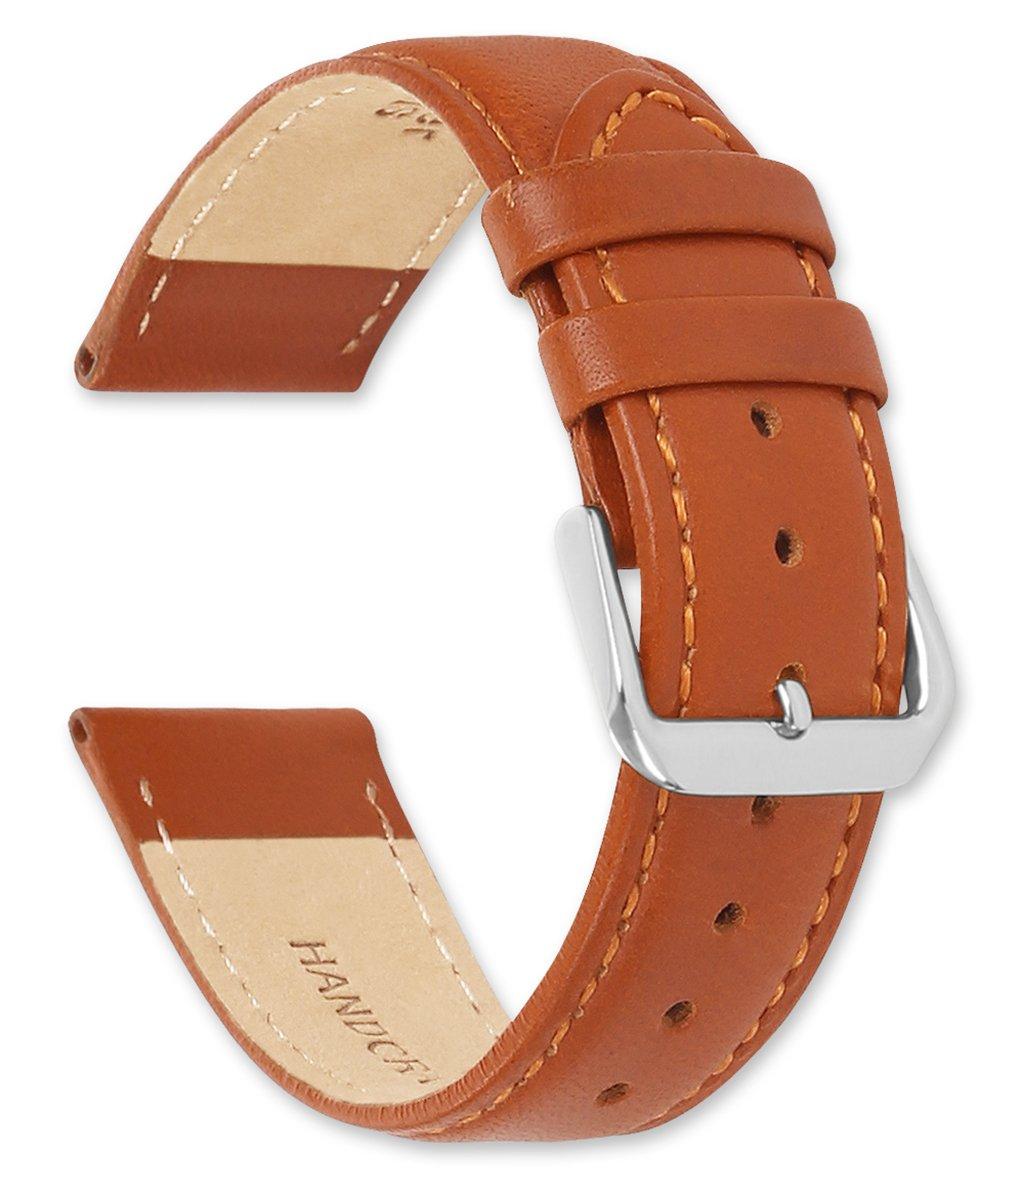 deBeer Stage Coach Leather Watch Strap - 17mm - Havana